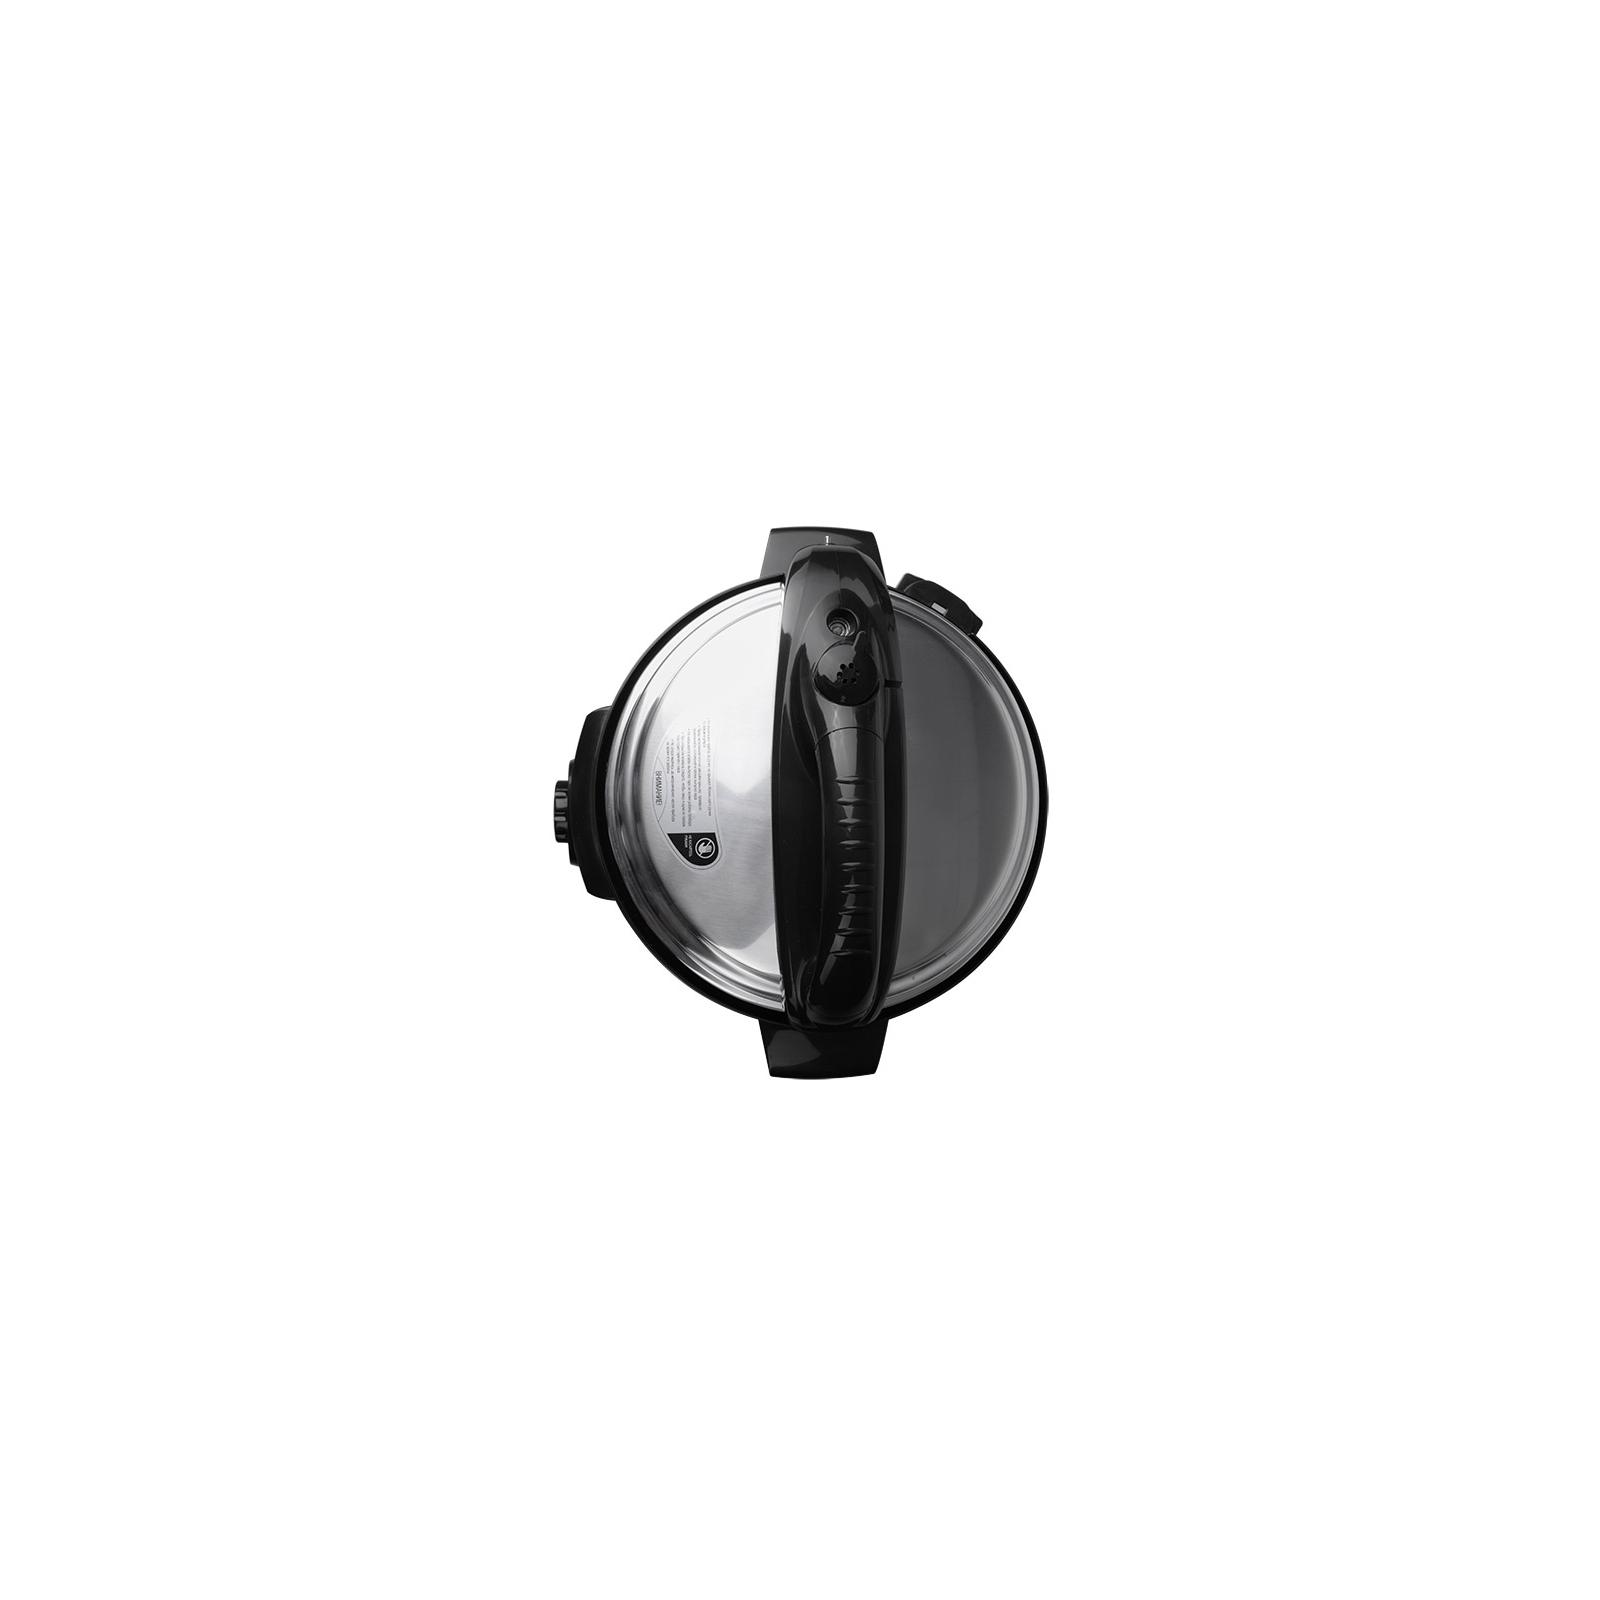 Мультиварка REDMOND RMC-PM4507 black изображение 6